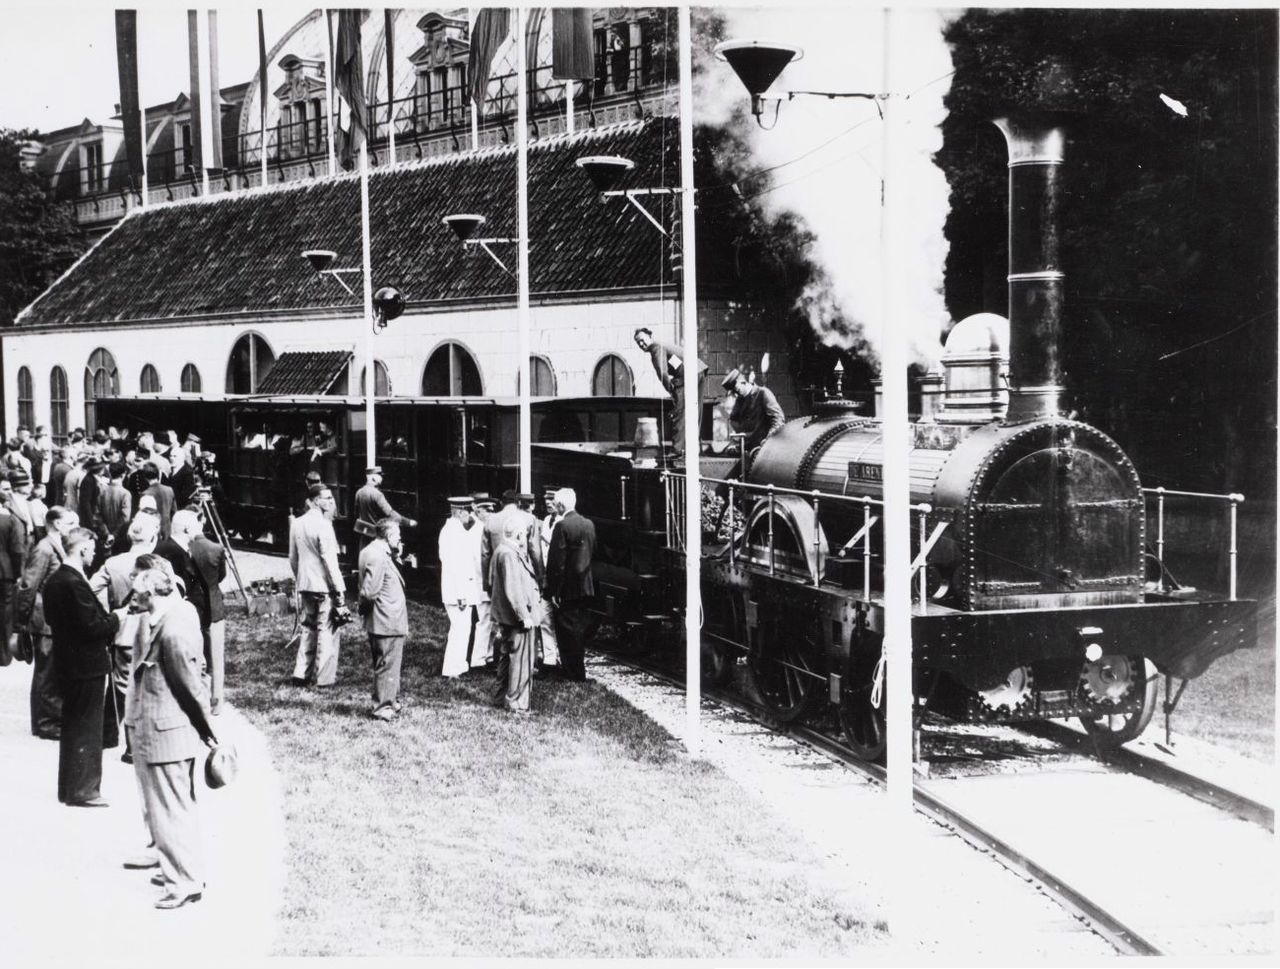 De verfransing van Wezembeek-Oppem kwam per trein